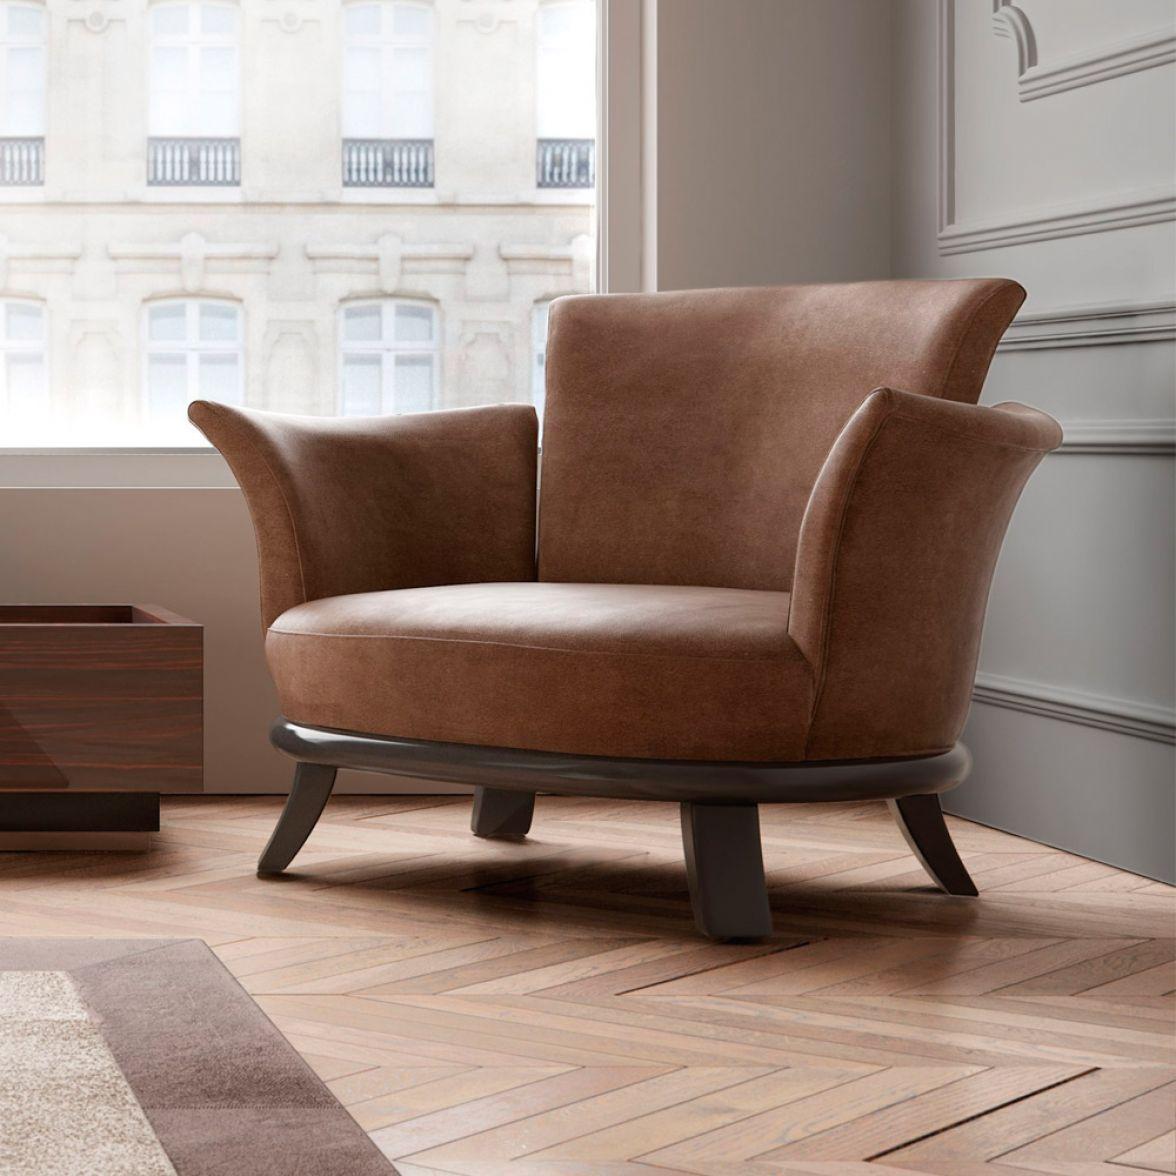 Kori armchair